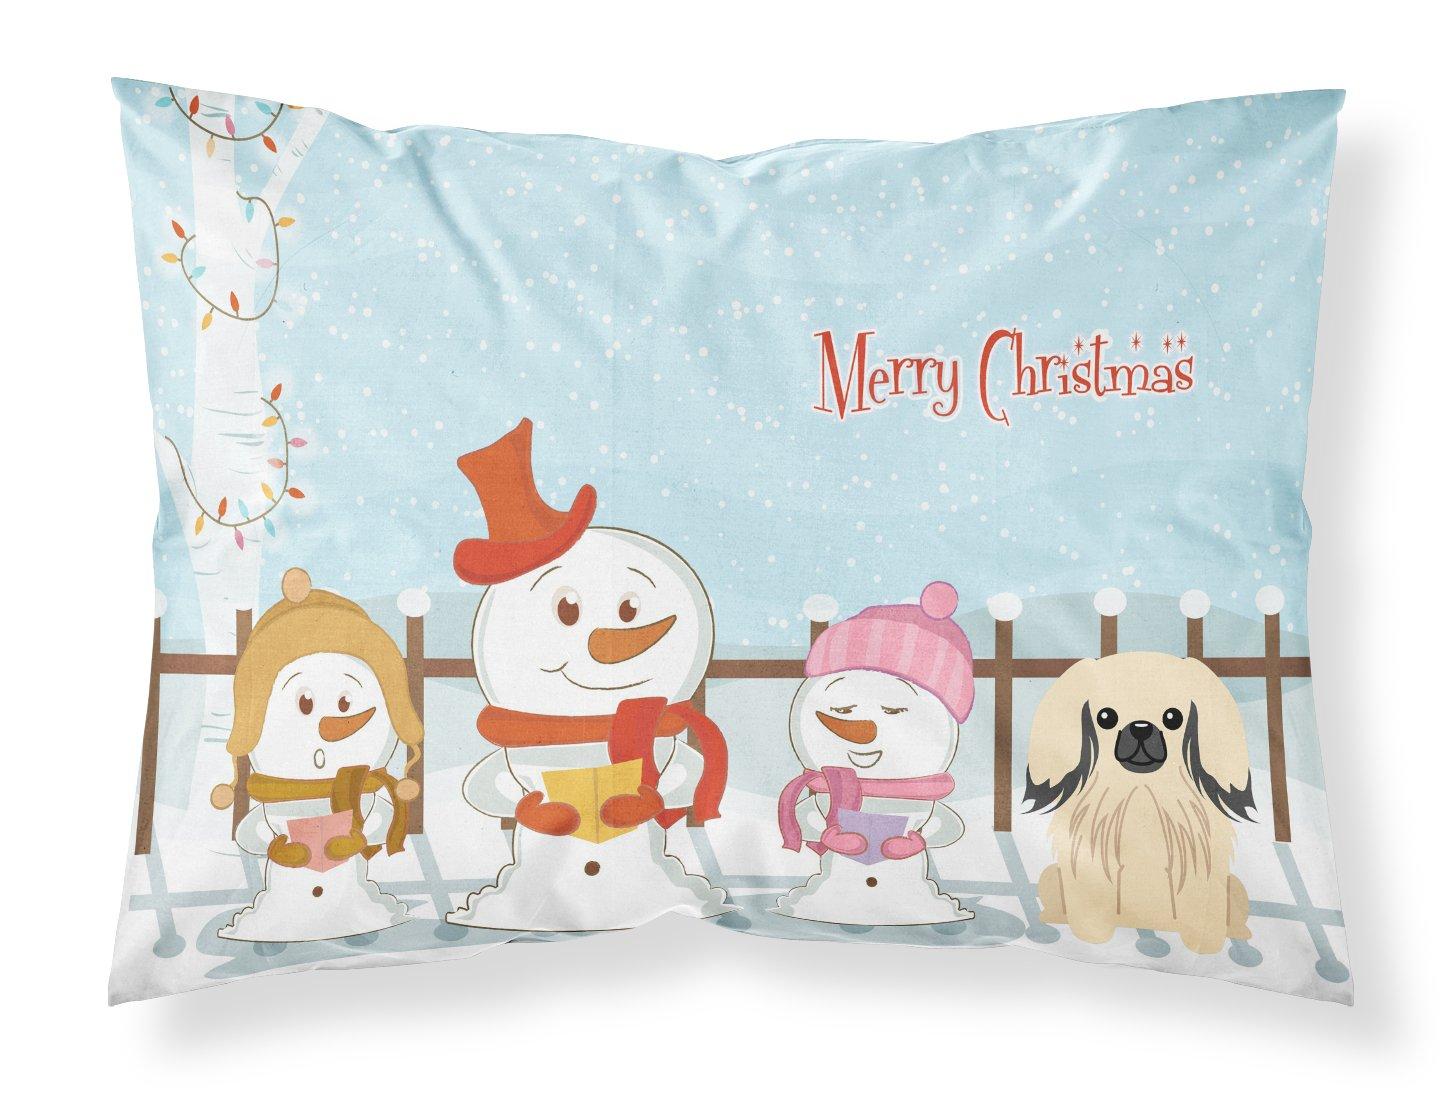 Carolines Treasures Dog House Collection Brittany Spaniel Fabric Standard Pillowcase BB2826PILLOWCASE,